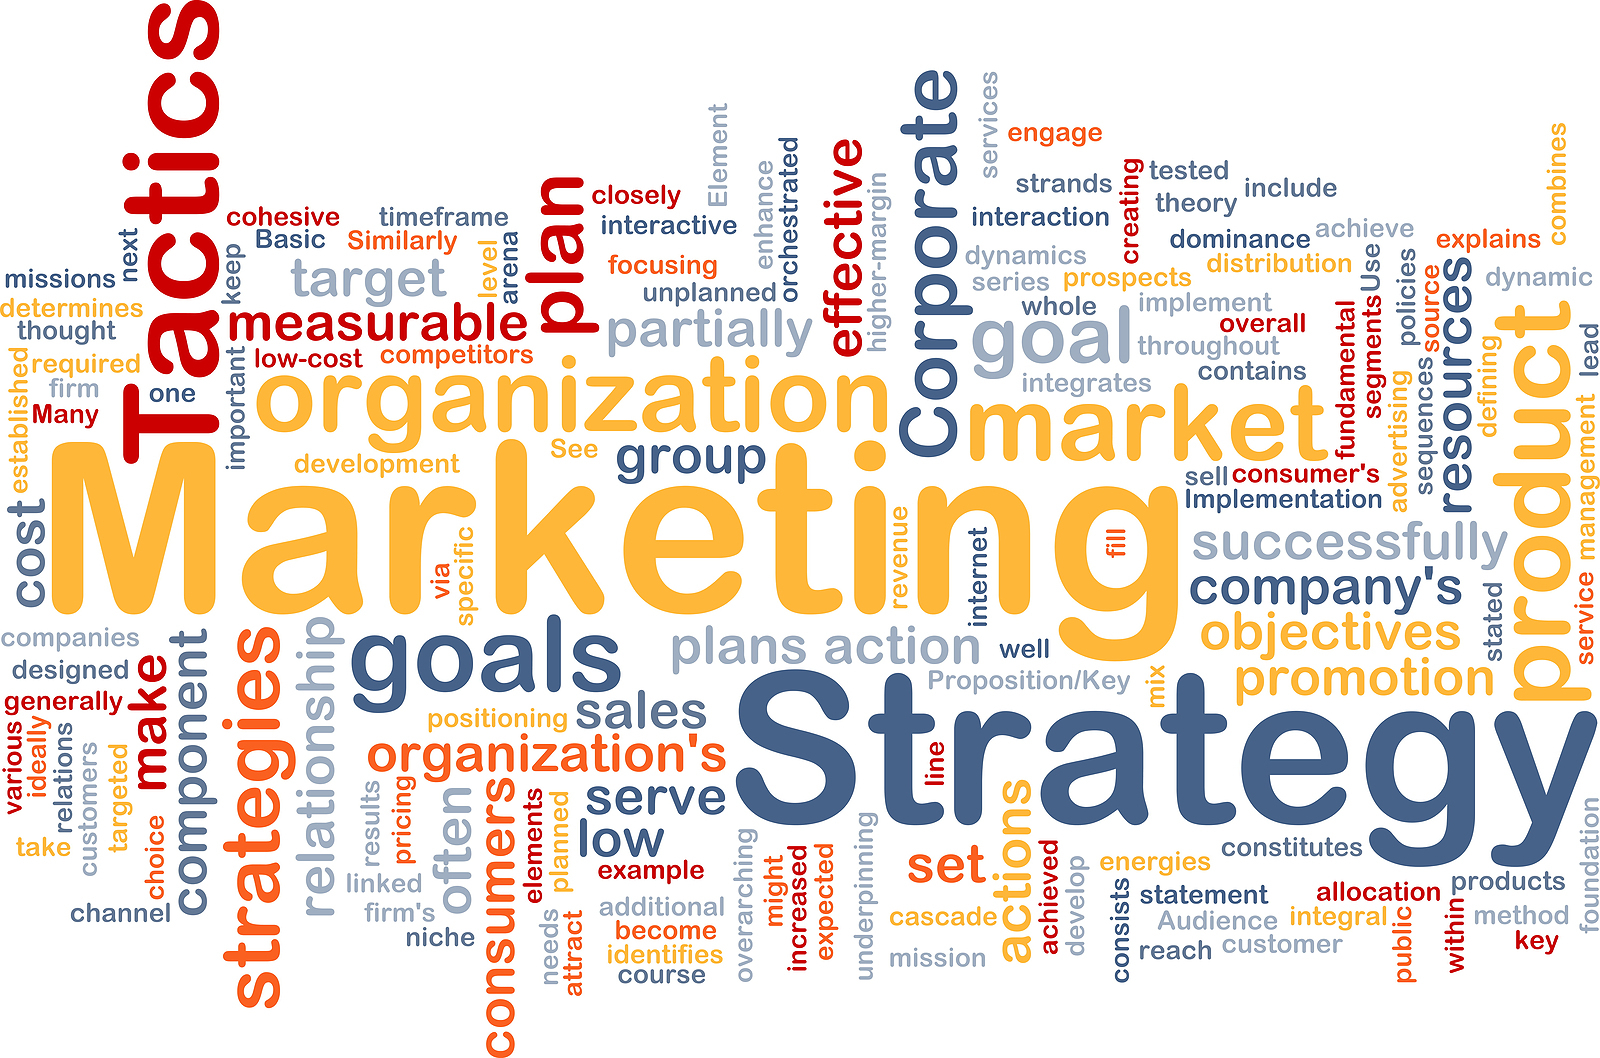 marketingCloud.jpg